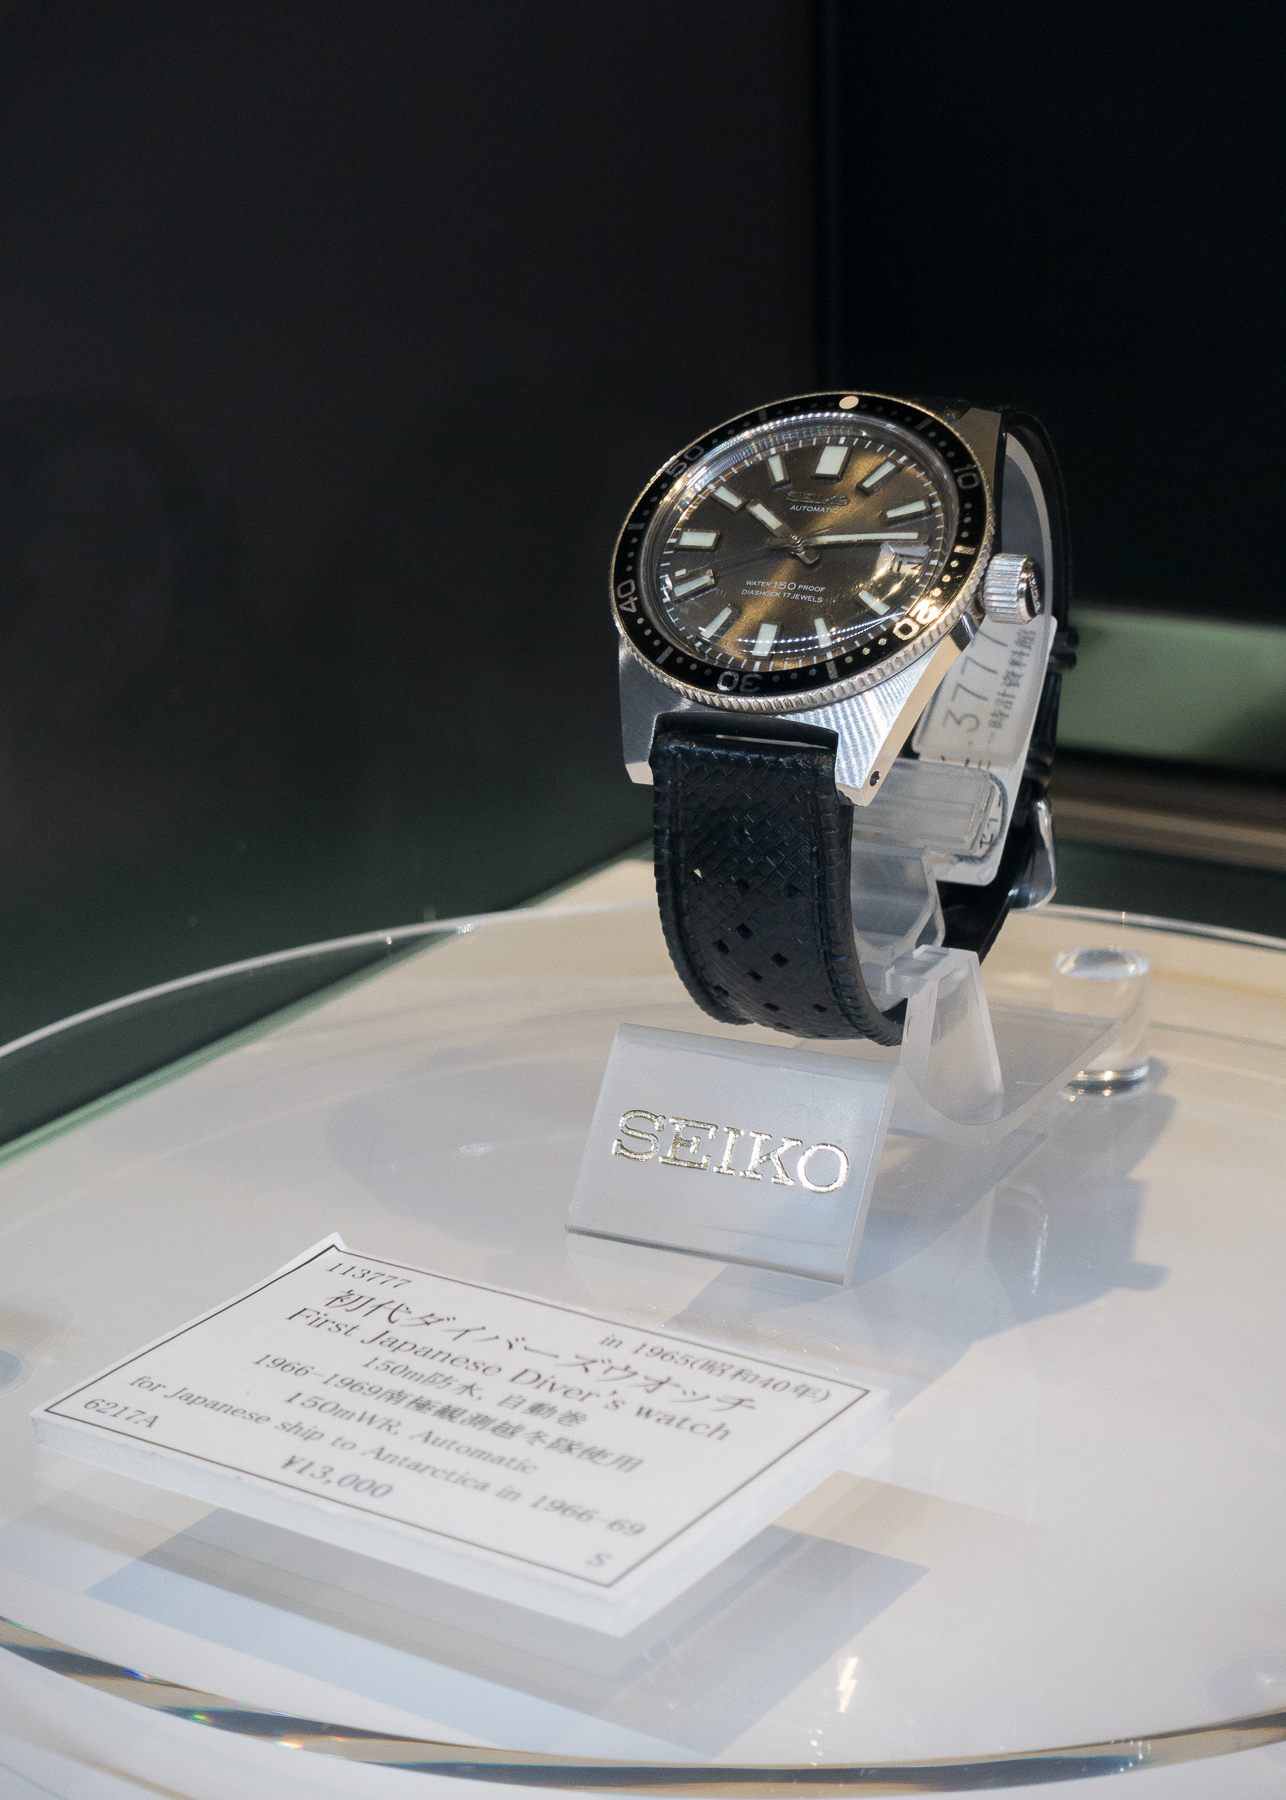 Seiko Museum - 62MAS Tropic